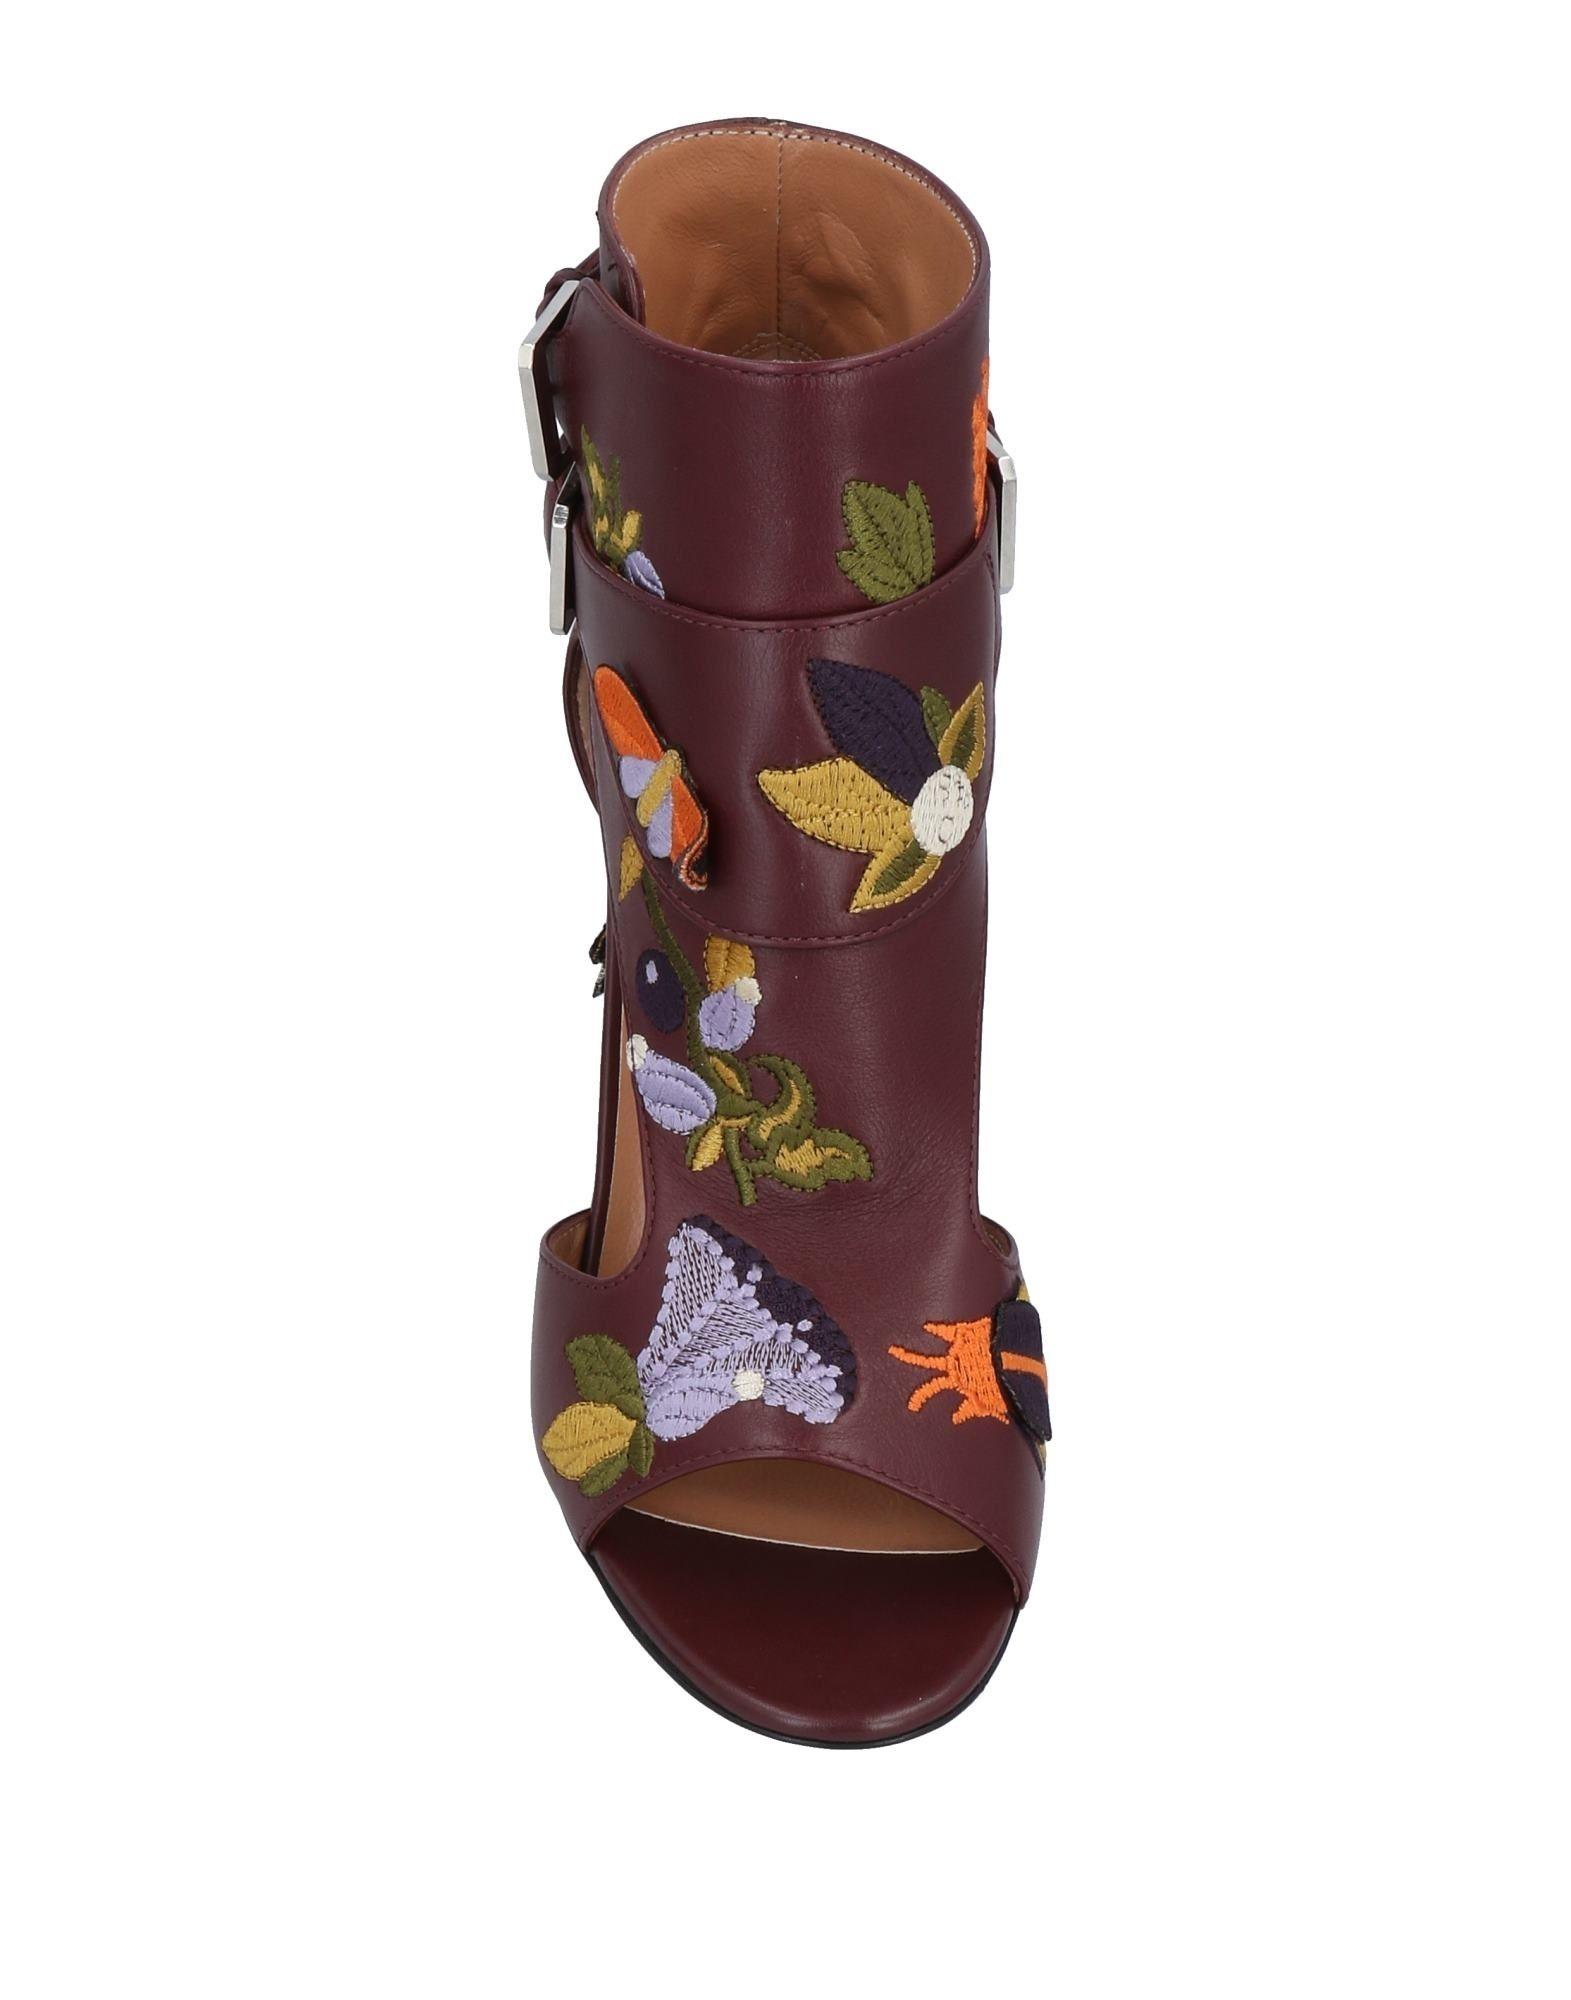 Laurence Dacade Sandalen Damen Schuhe  11494383KMGünstige gut aussehende Schuhe Damen c8f588